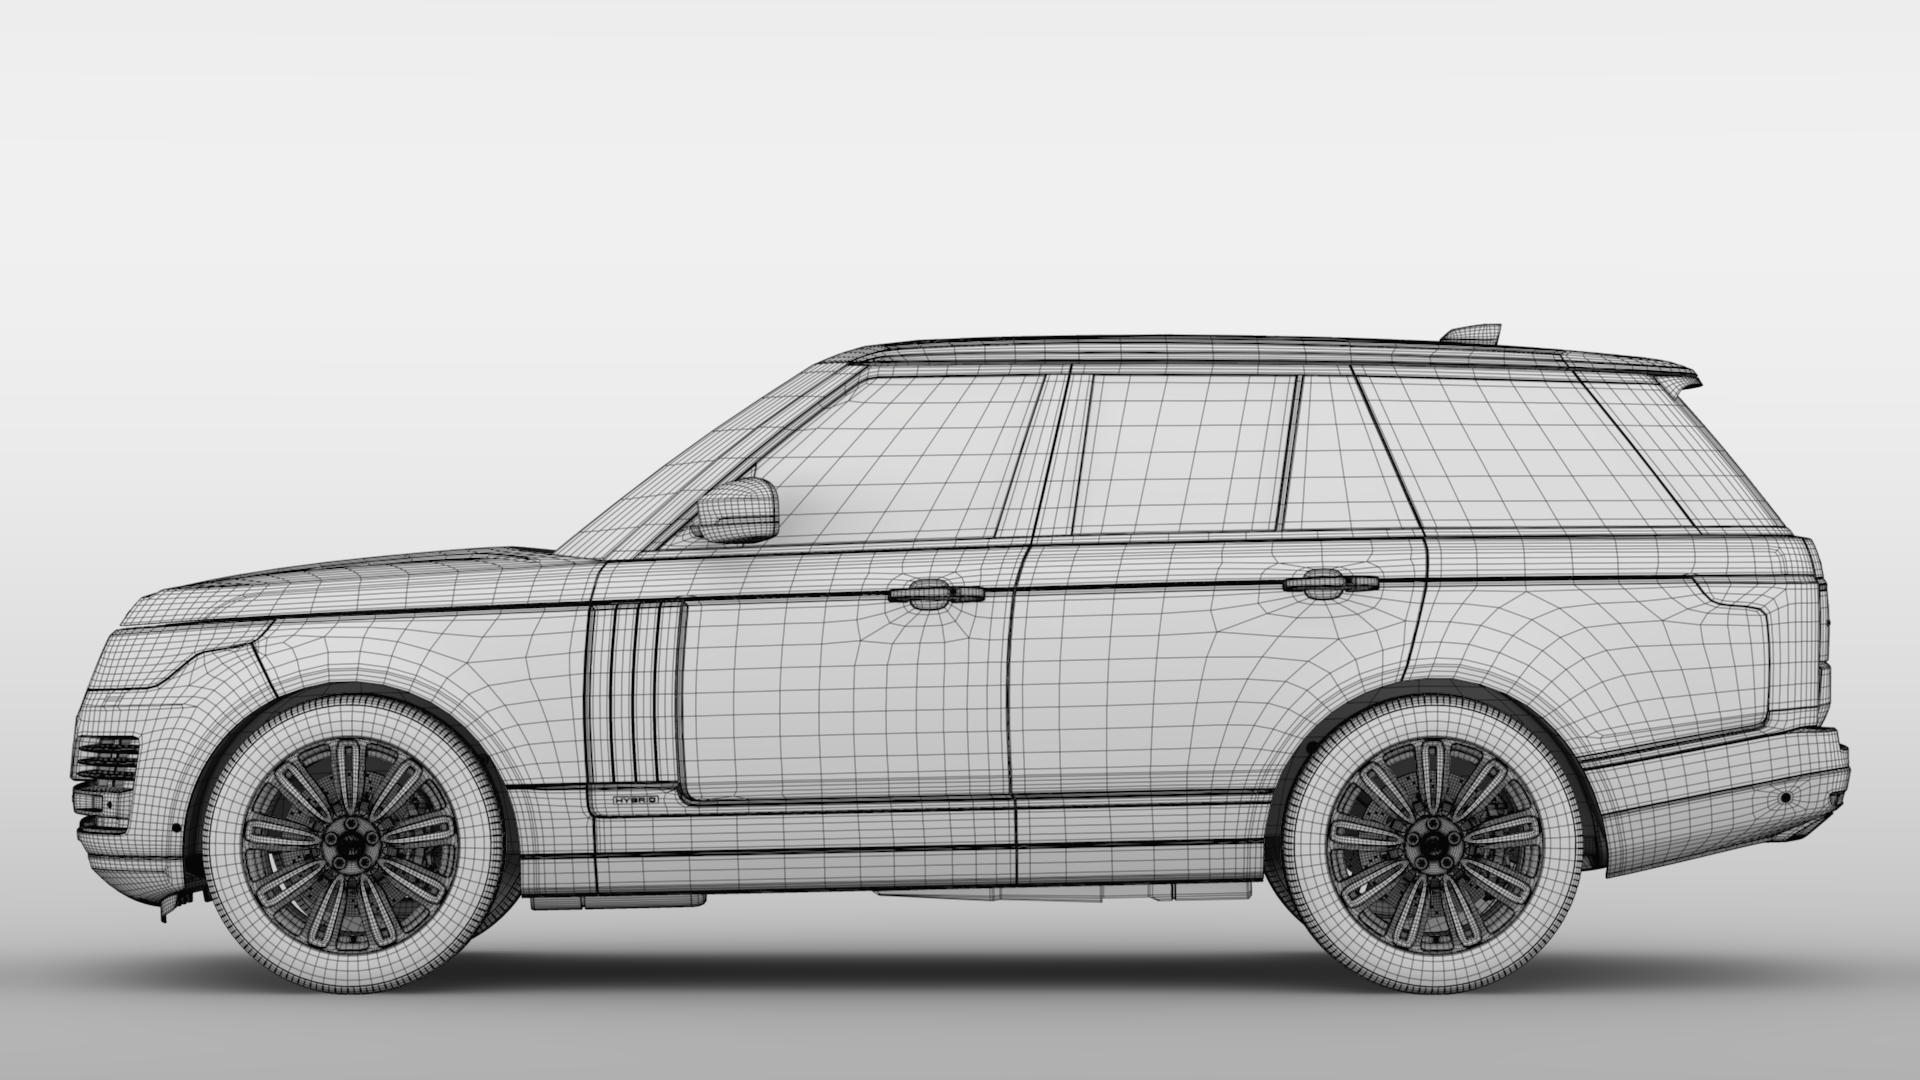 range rover autobiography hybrid (l405) 2018 3d model max fbx c4d lwo ma mb hrc xsi obj 278161